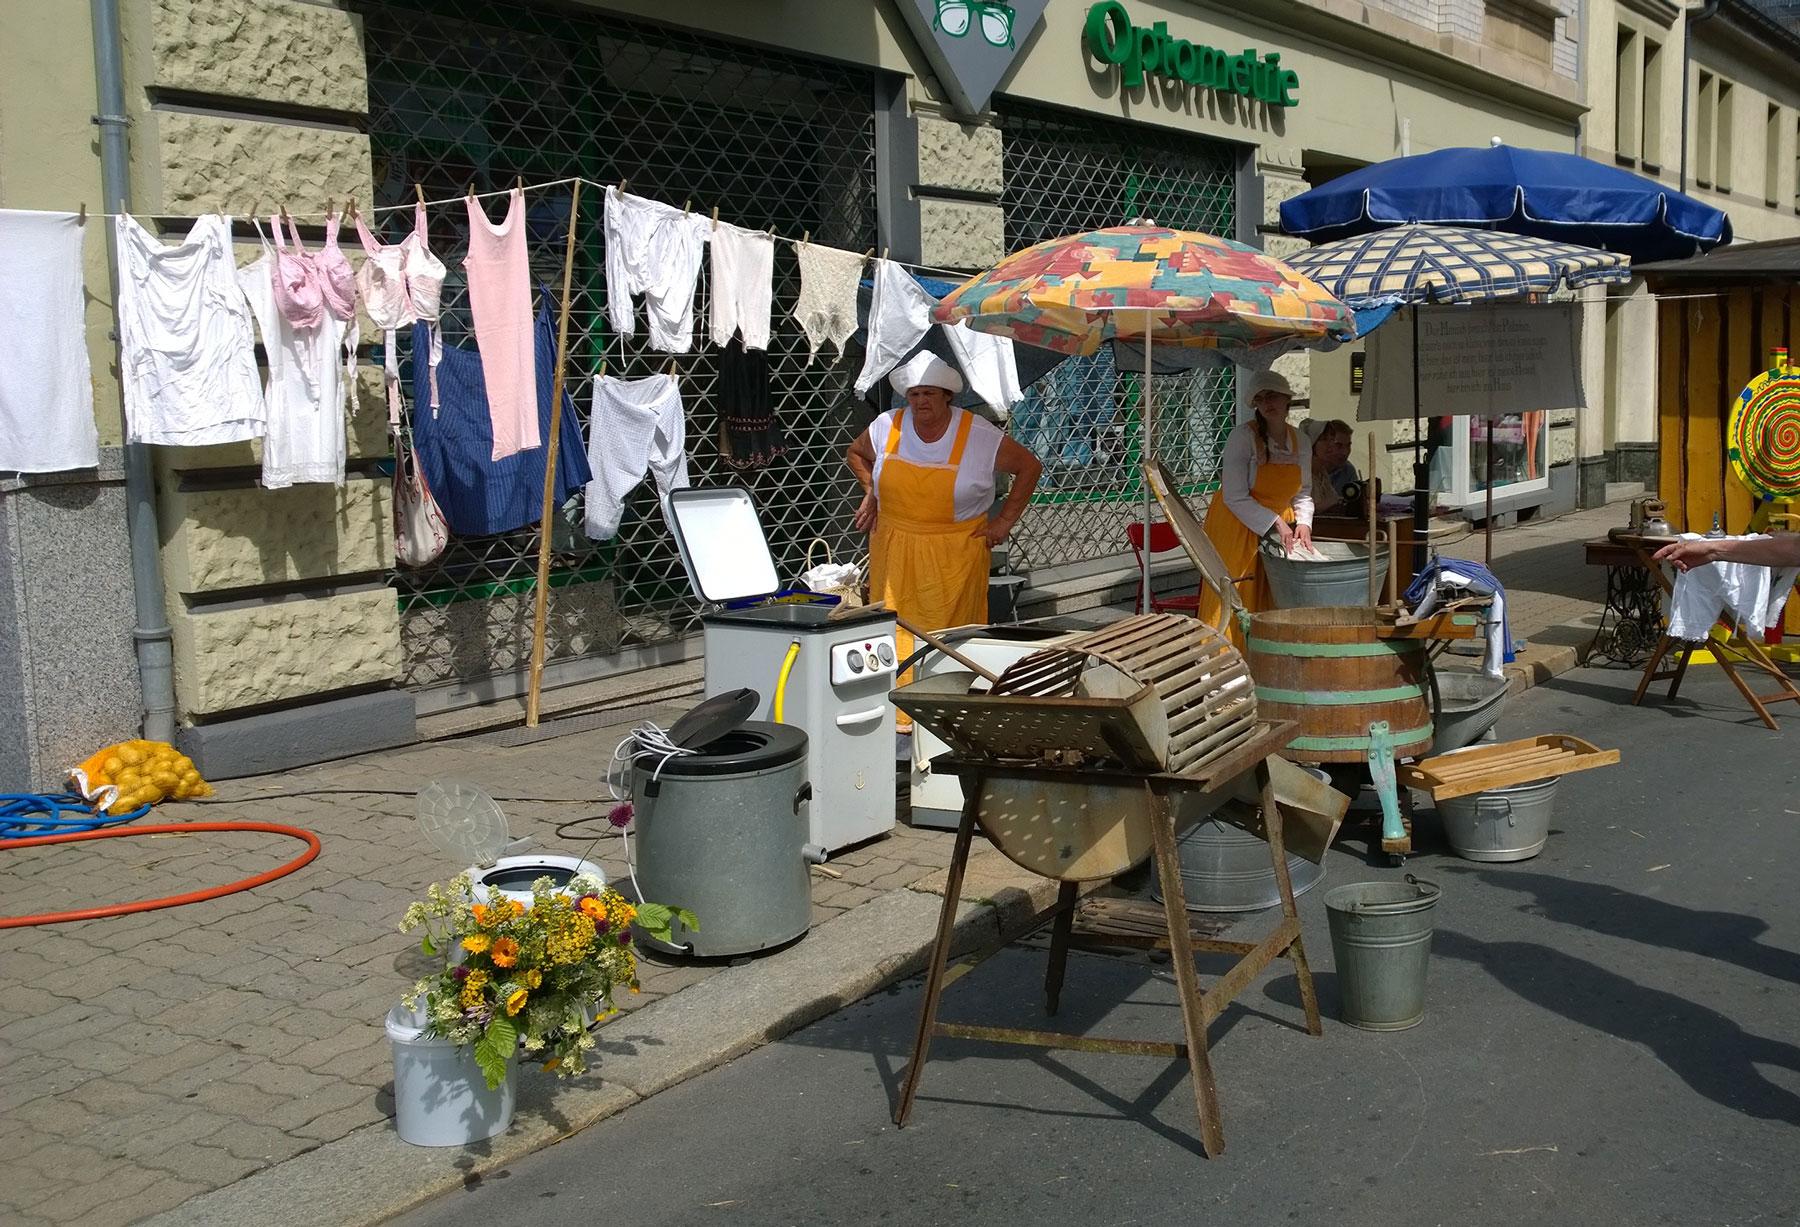 Stadtfest Aue 2014 Erzgebirge 3